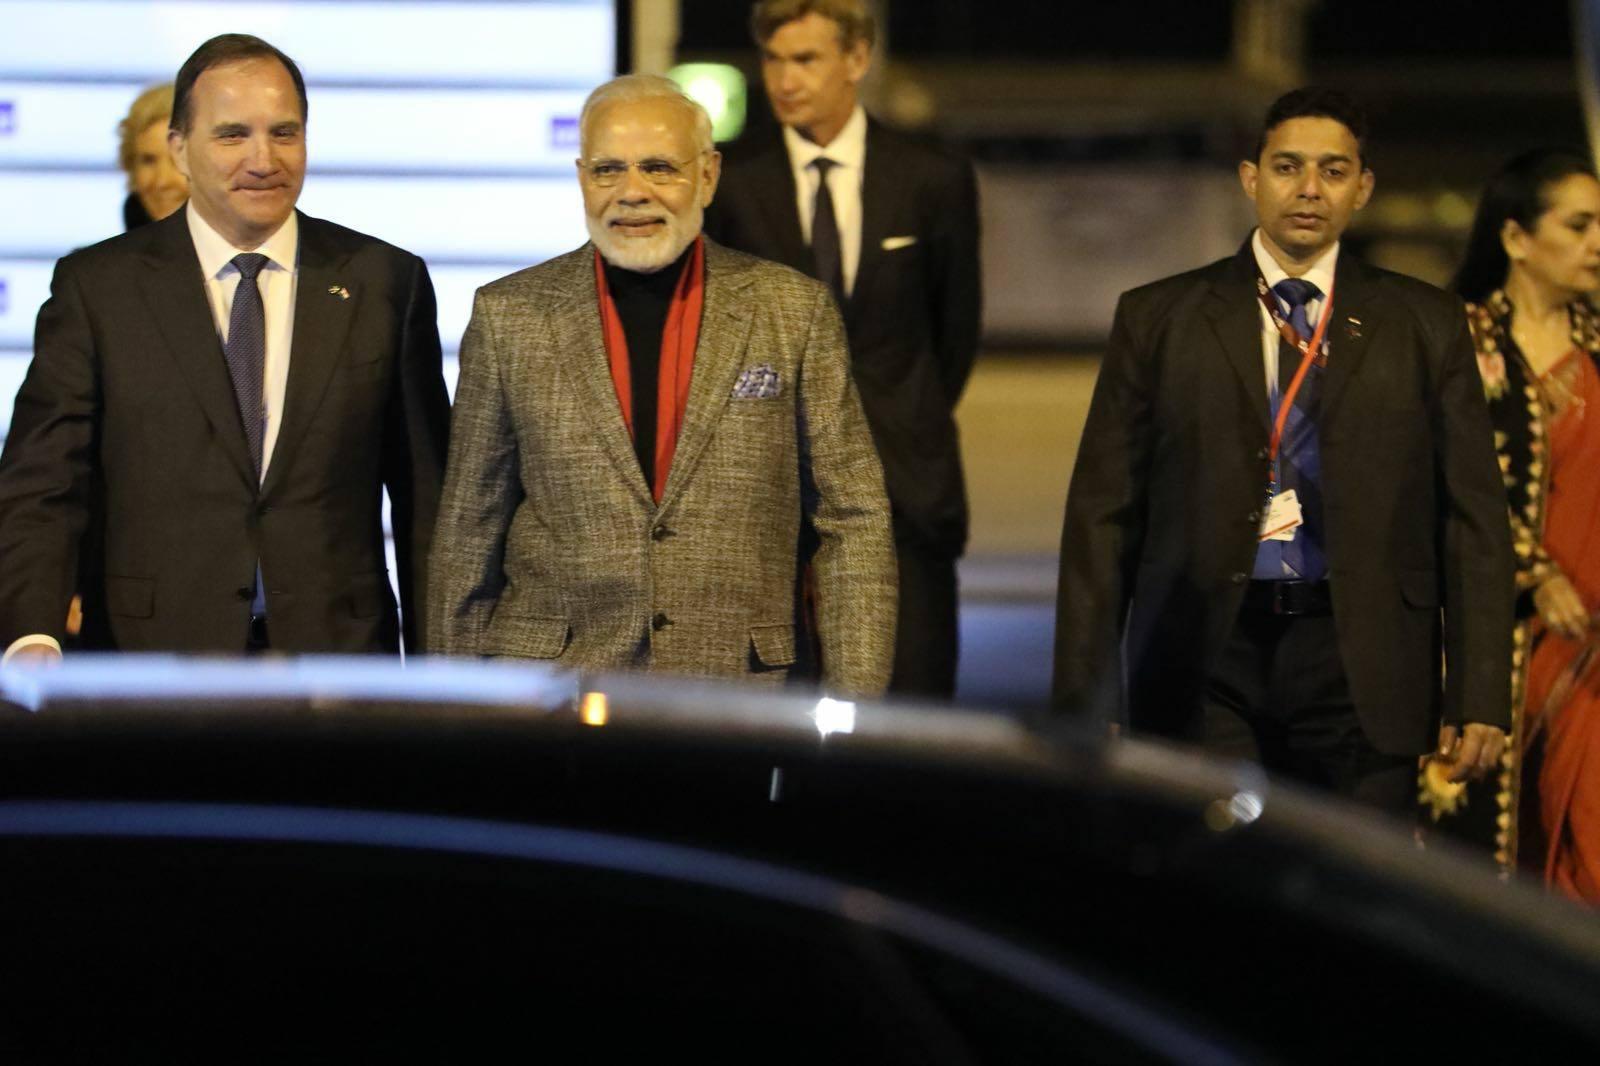 Prime Minister Narendra Modi welcomed by Swedish Prime Minister Stefan Lofven on arrival at the Arlanda Airport in Stockholm